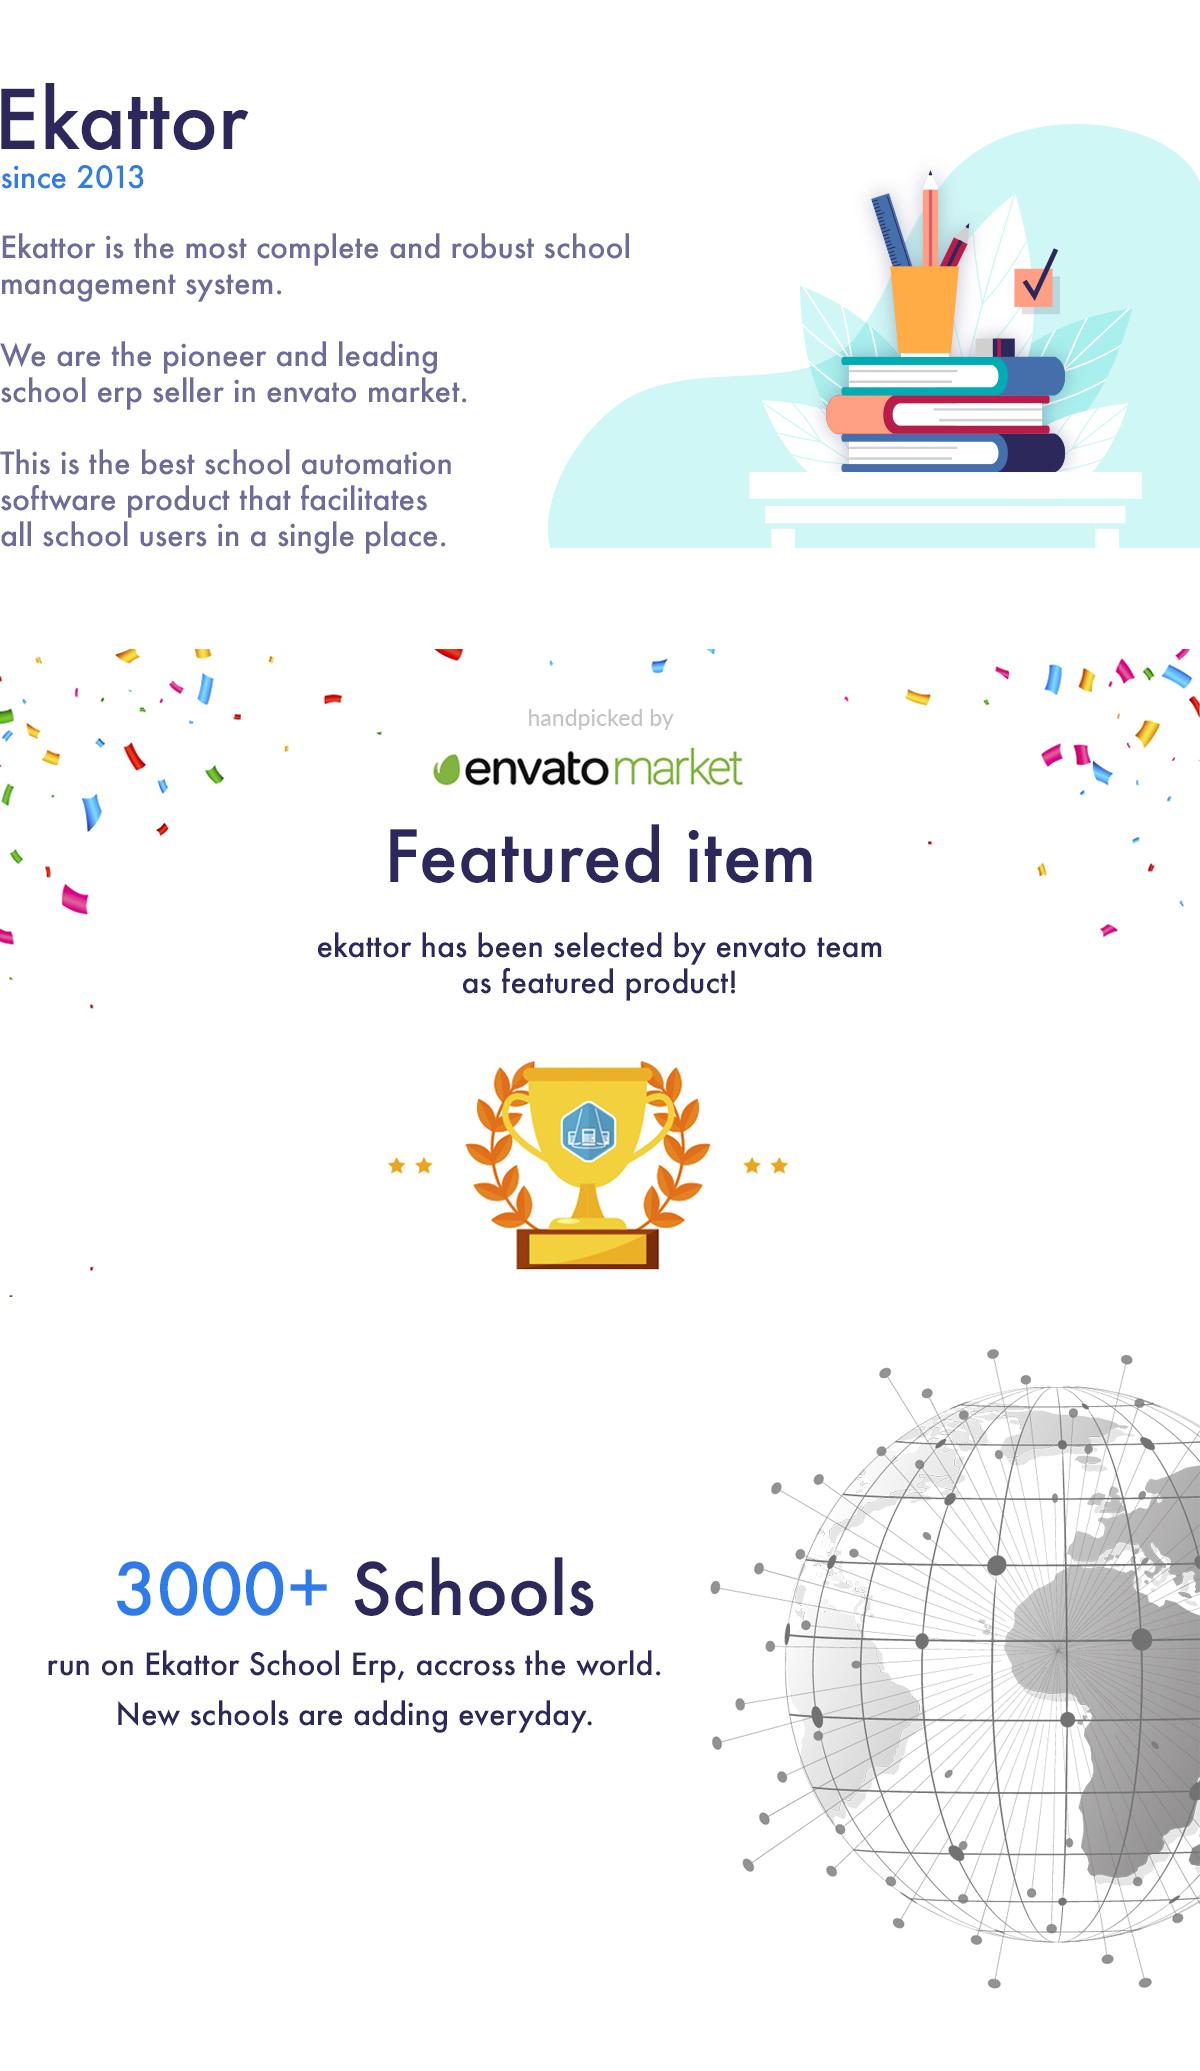 Ekattor School Management System - 4